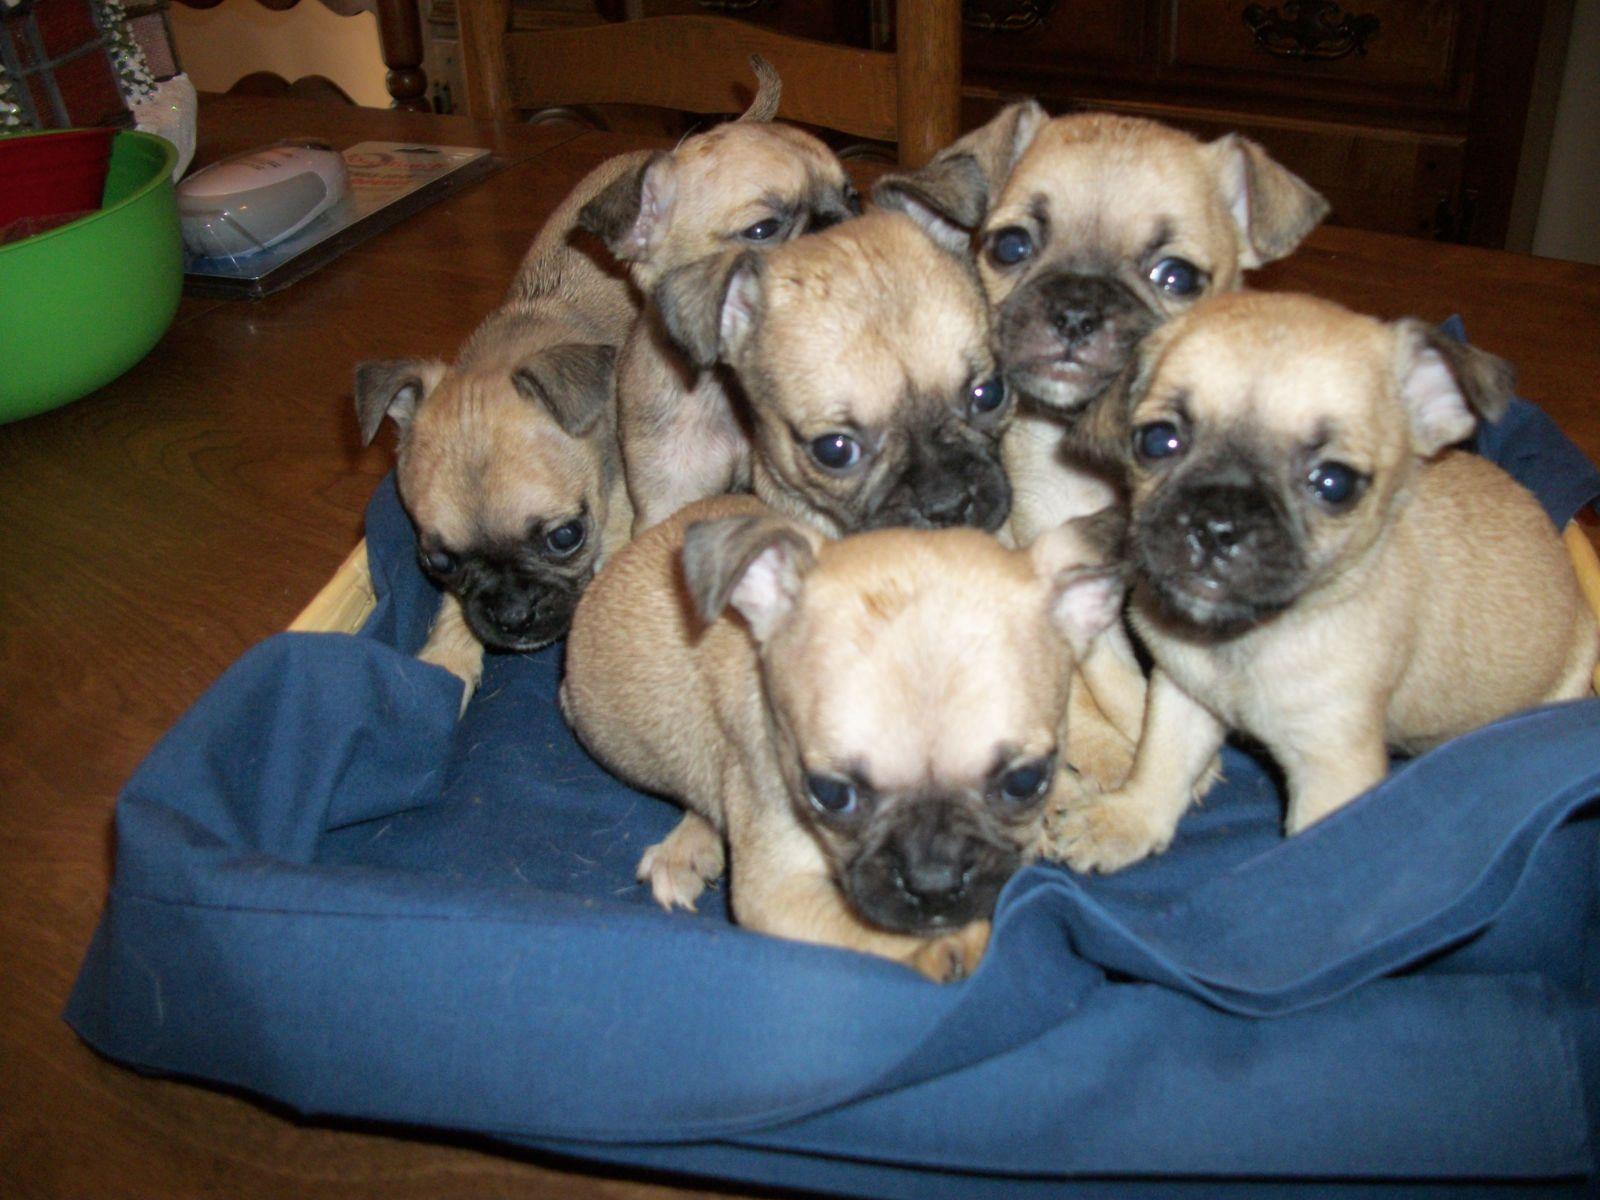 Teacup Chug Puppies Chug Puppies Chiweenie Puppies Baby Dogs